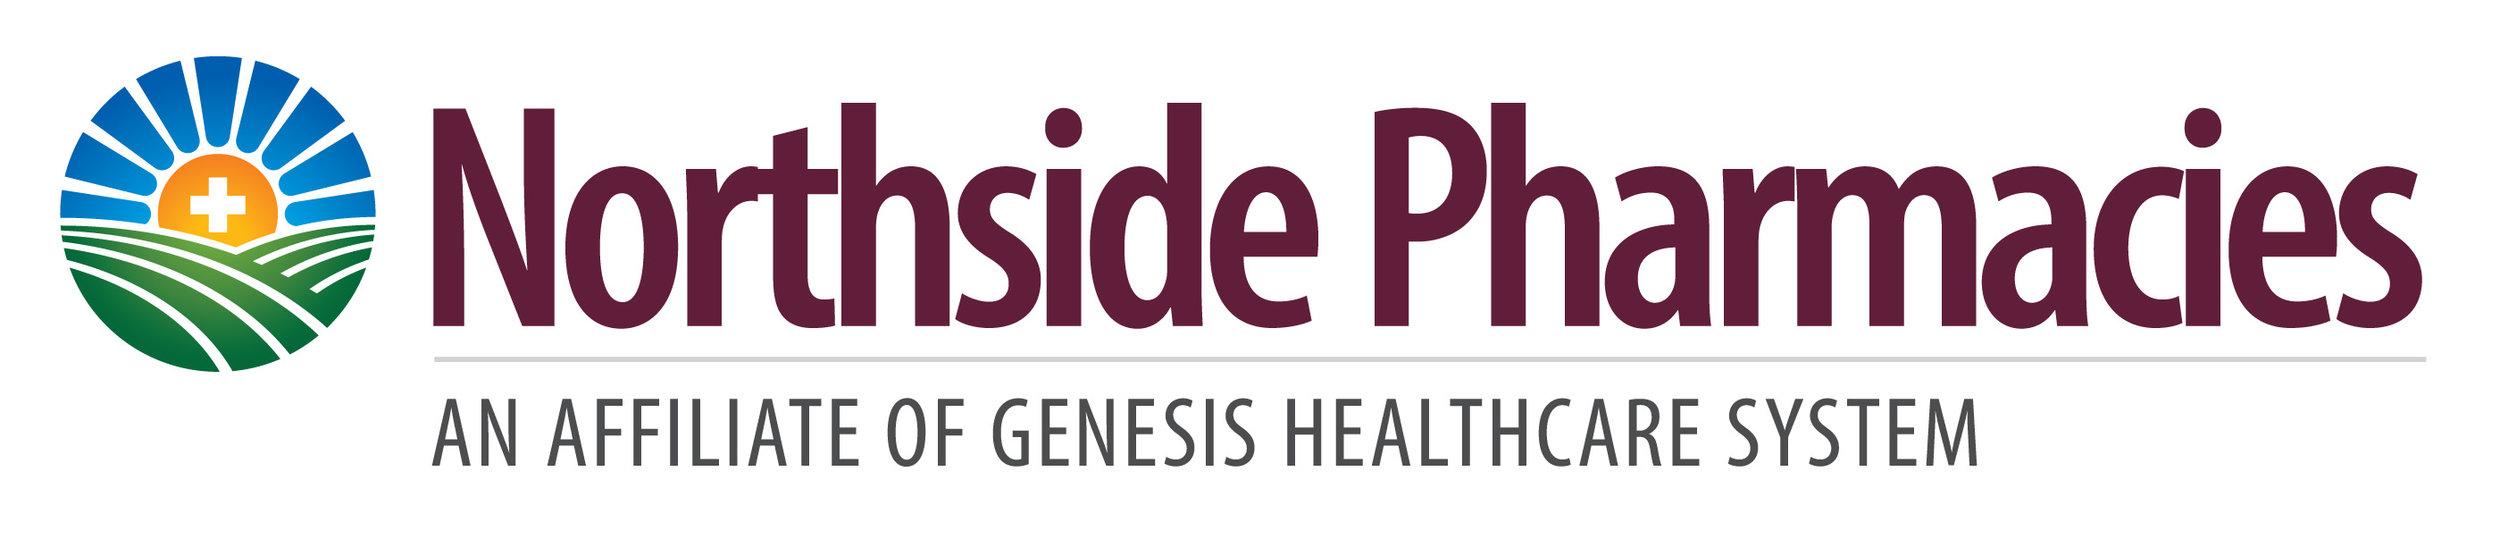 2017 Northside Logo.jpg